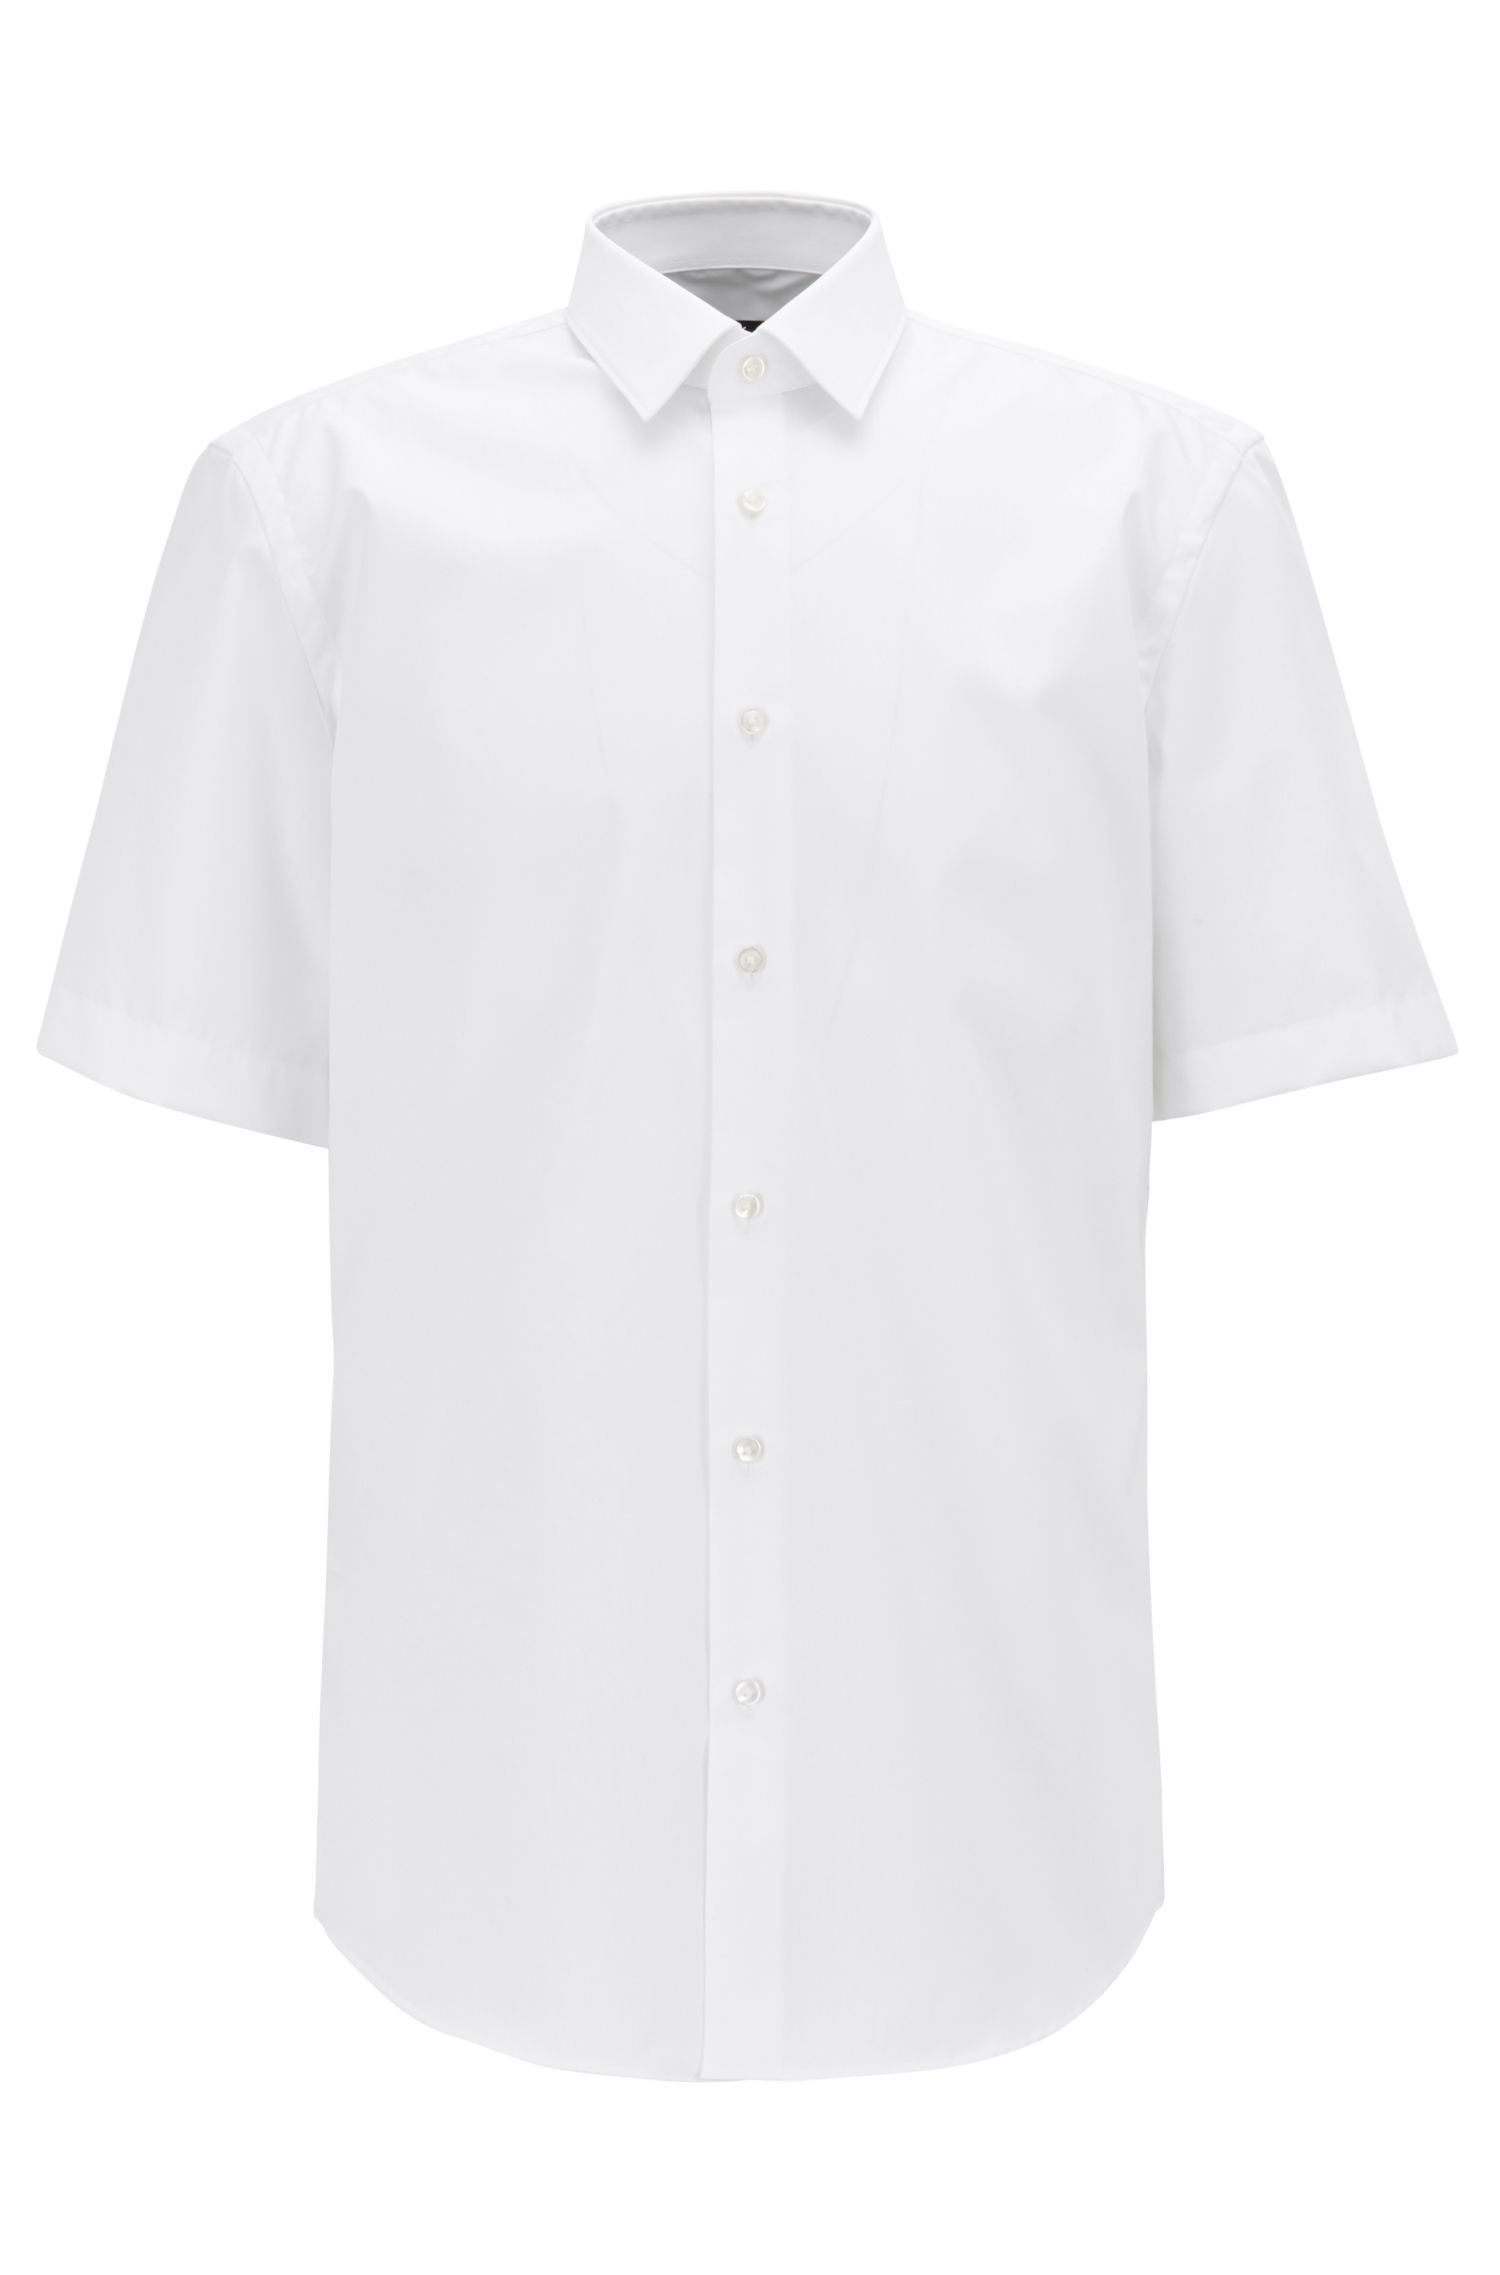 Short-sleeved regular-fit shirt in easy-iron cotton, White